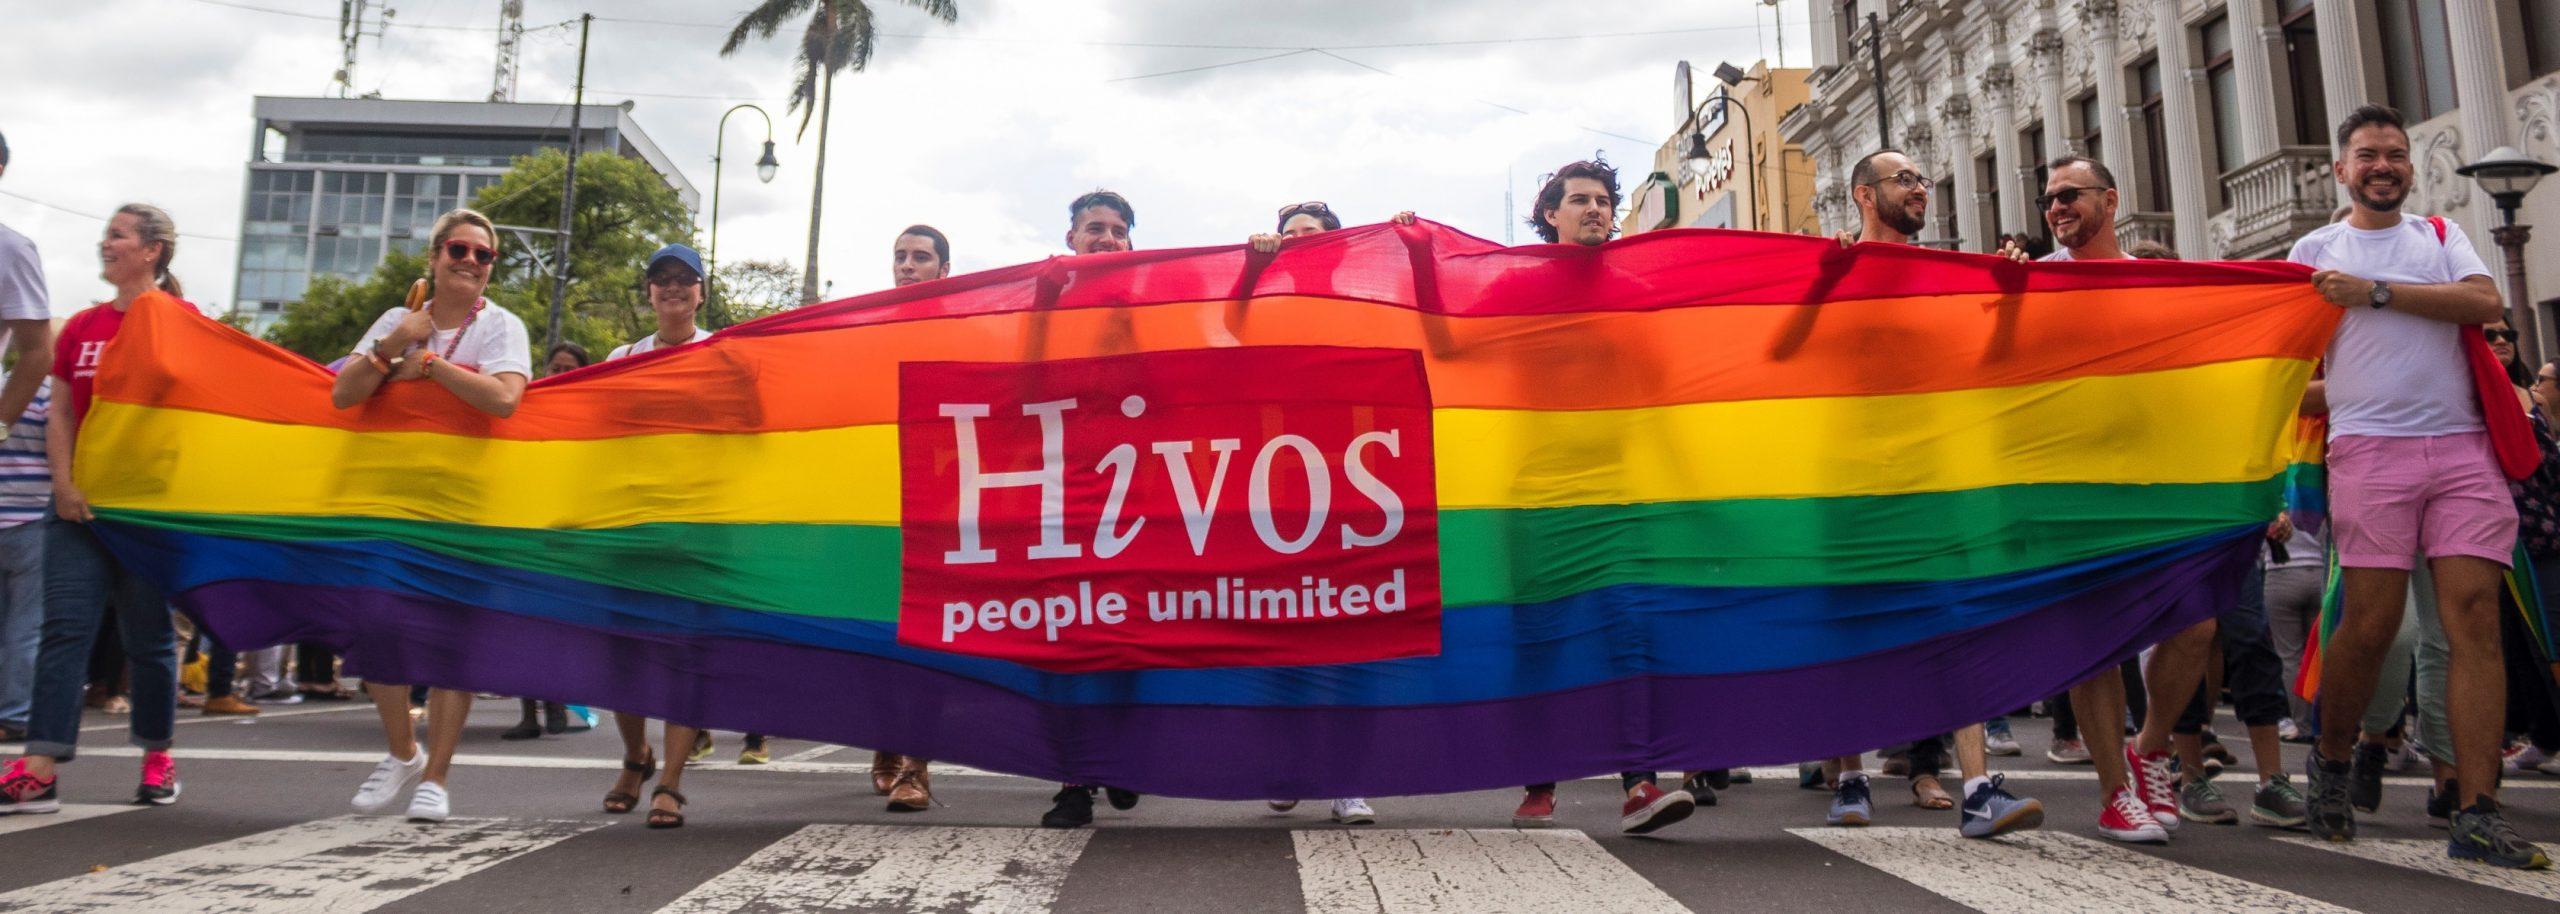 Hivos in Latin America